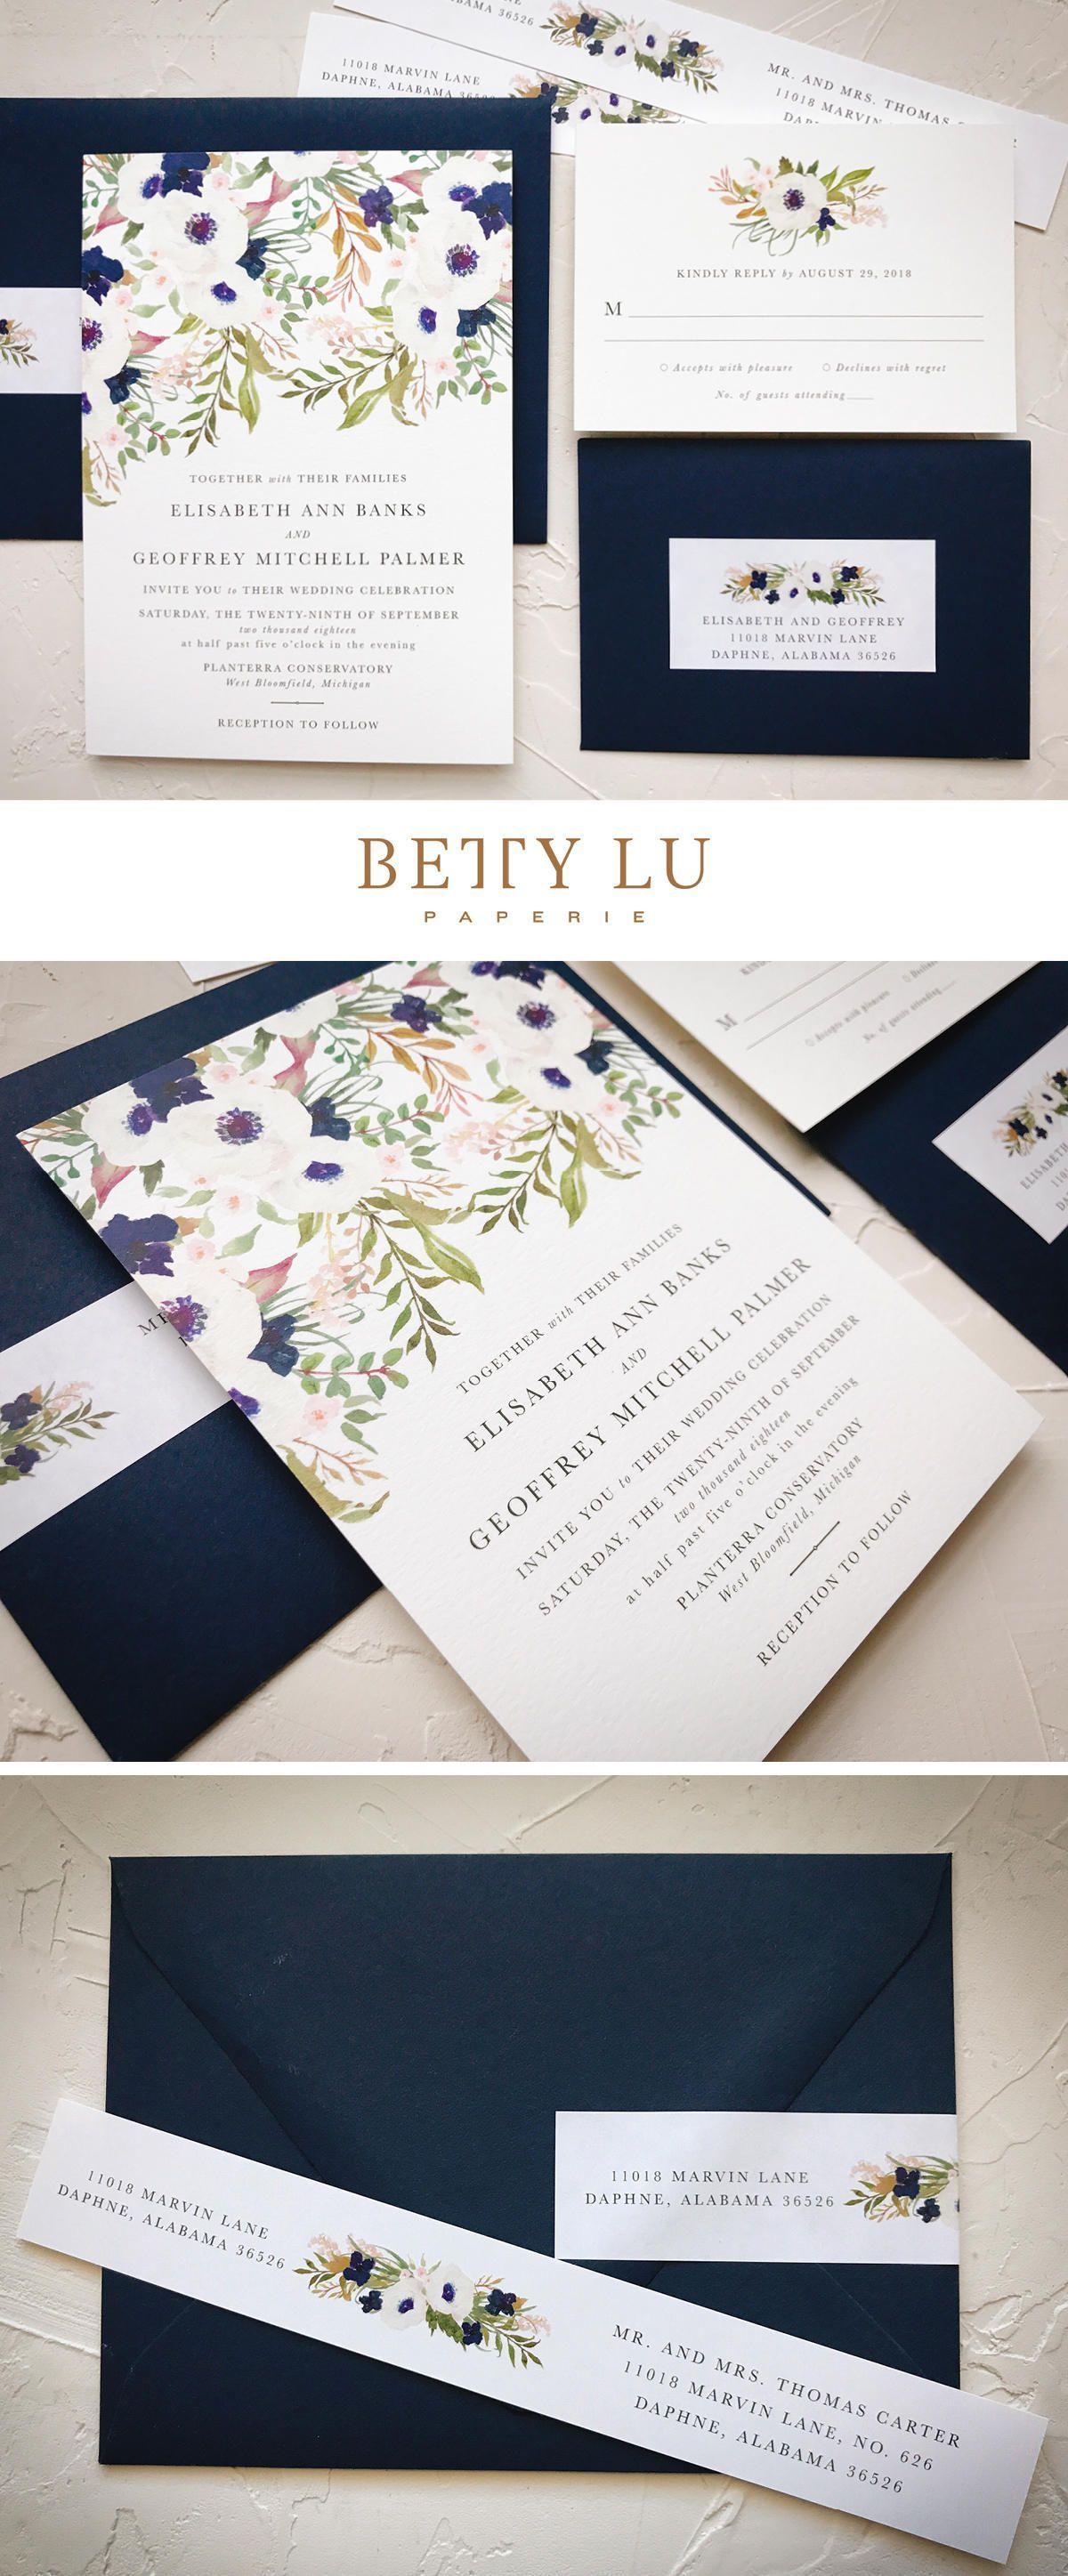 Navy Floral Wedding Invitations Garden Boho Elegant Rustic Fall Bohowedding Weddingideas Weddinginvitation: Navy Garden Wedding Invitations At Reisefeber.org